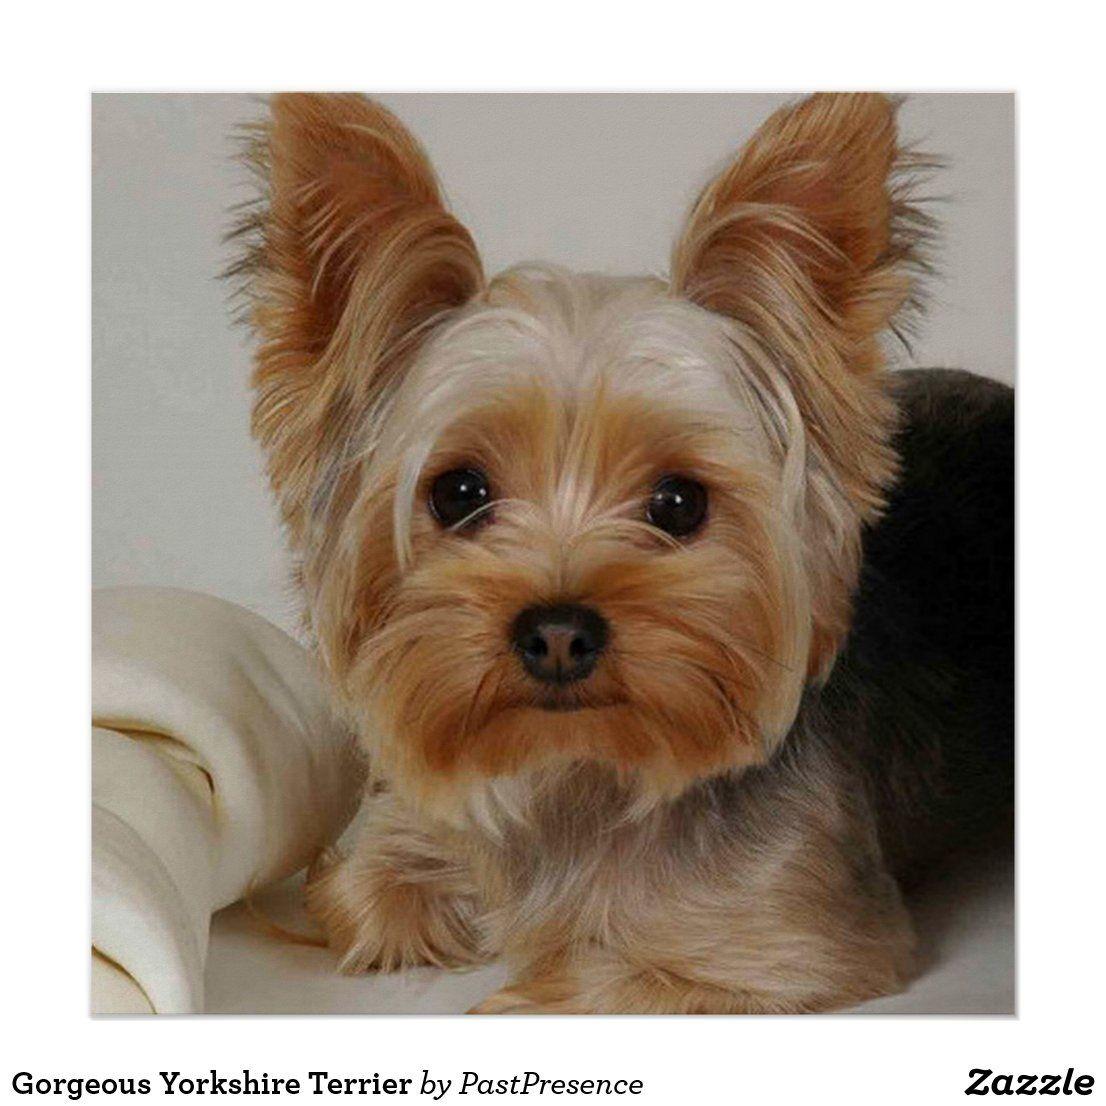 Gorgeous Yorkshire Terrier Poster Zazzle Com In 2020 Yorkshire Terrier Puppies Yorkshire Terrier Dog Terrier Dogs